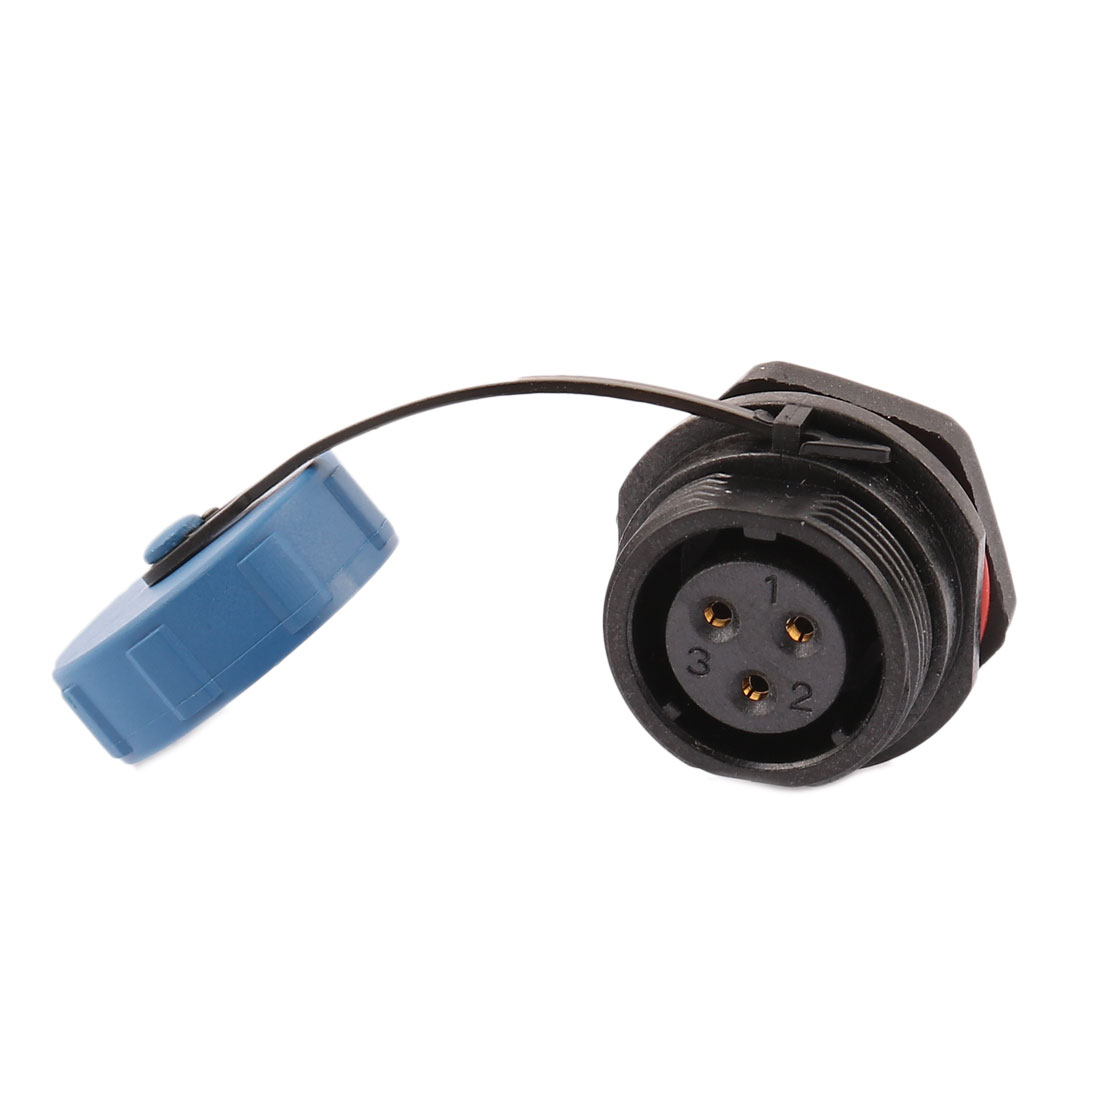 AC 500V 3 Poles SP1712/S Waterproof Aviation Socket Dustproof Adapter Connector